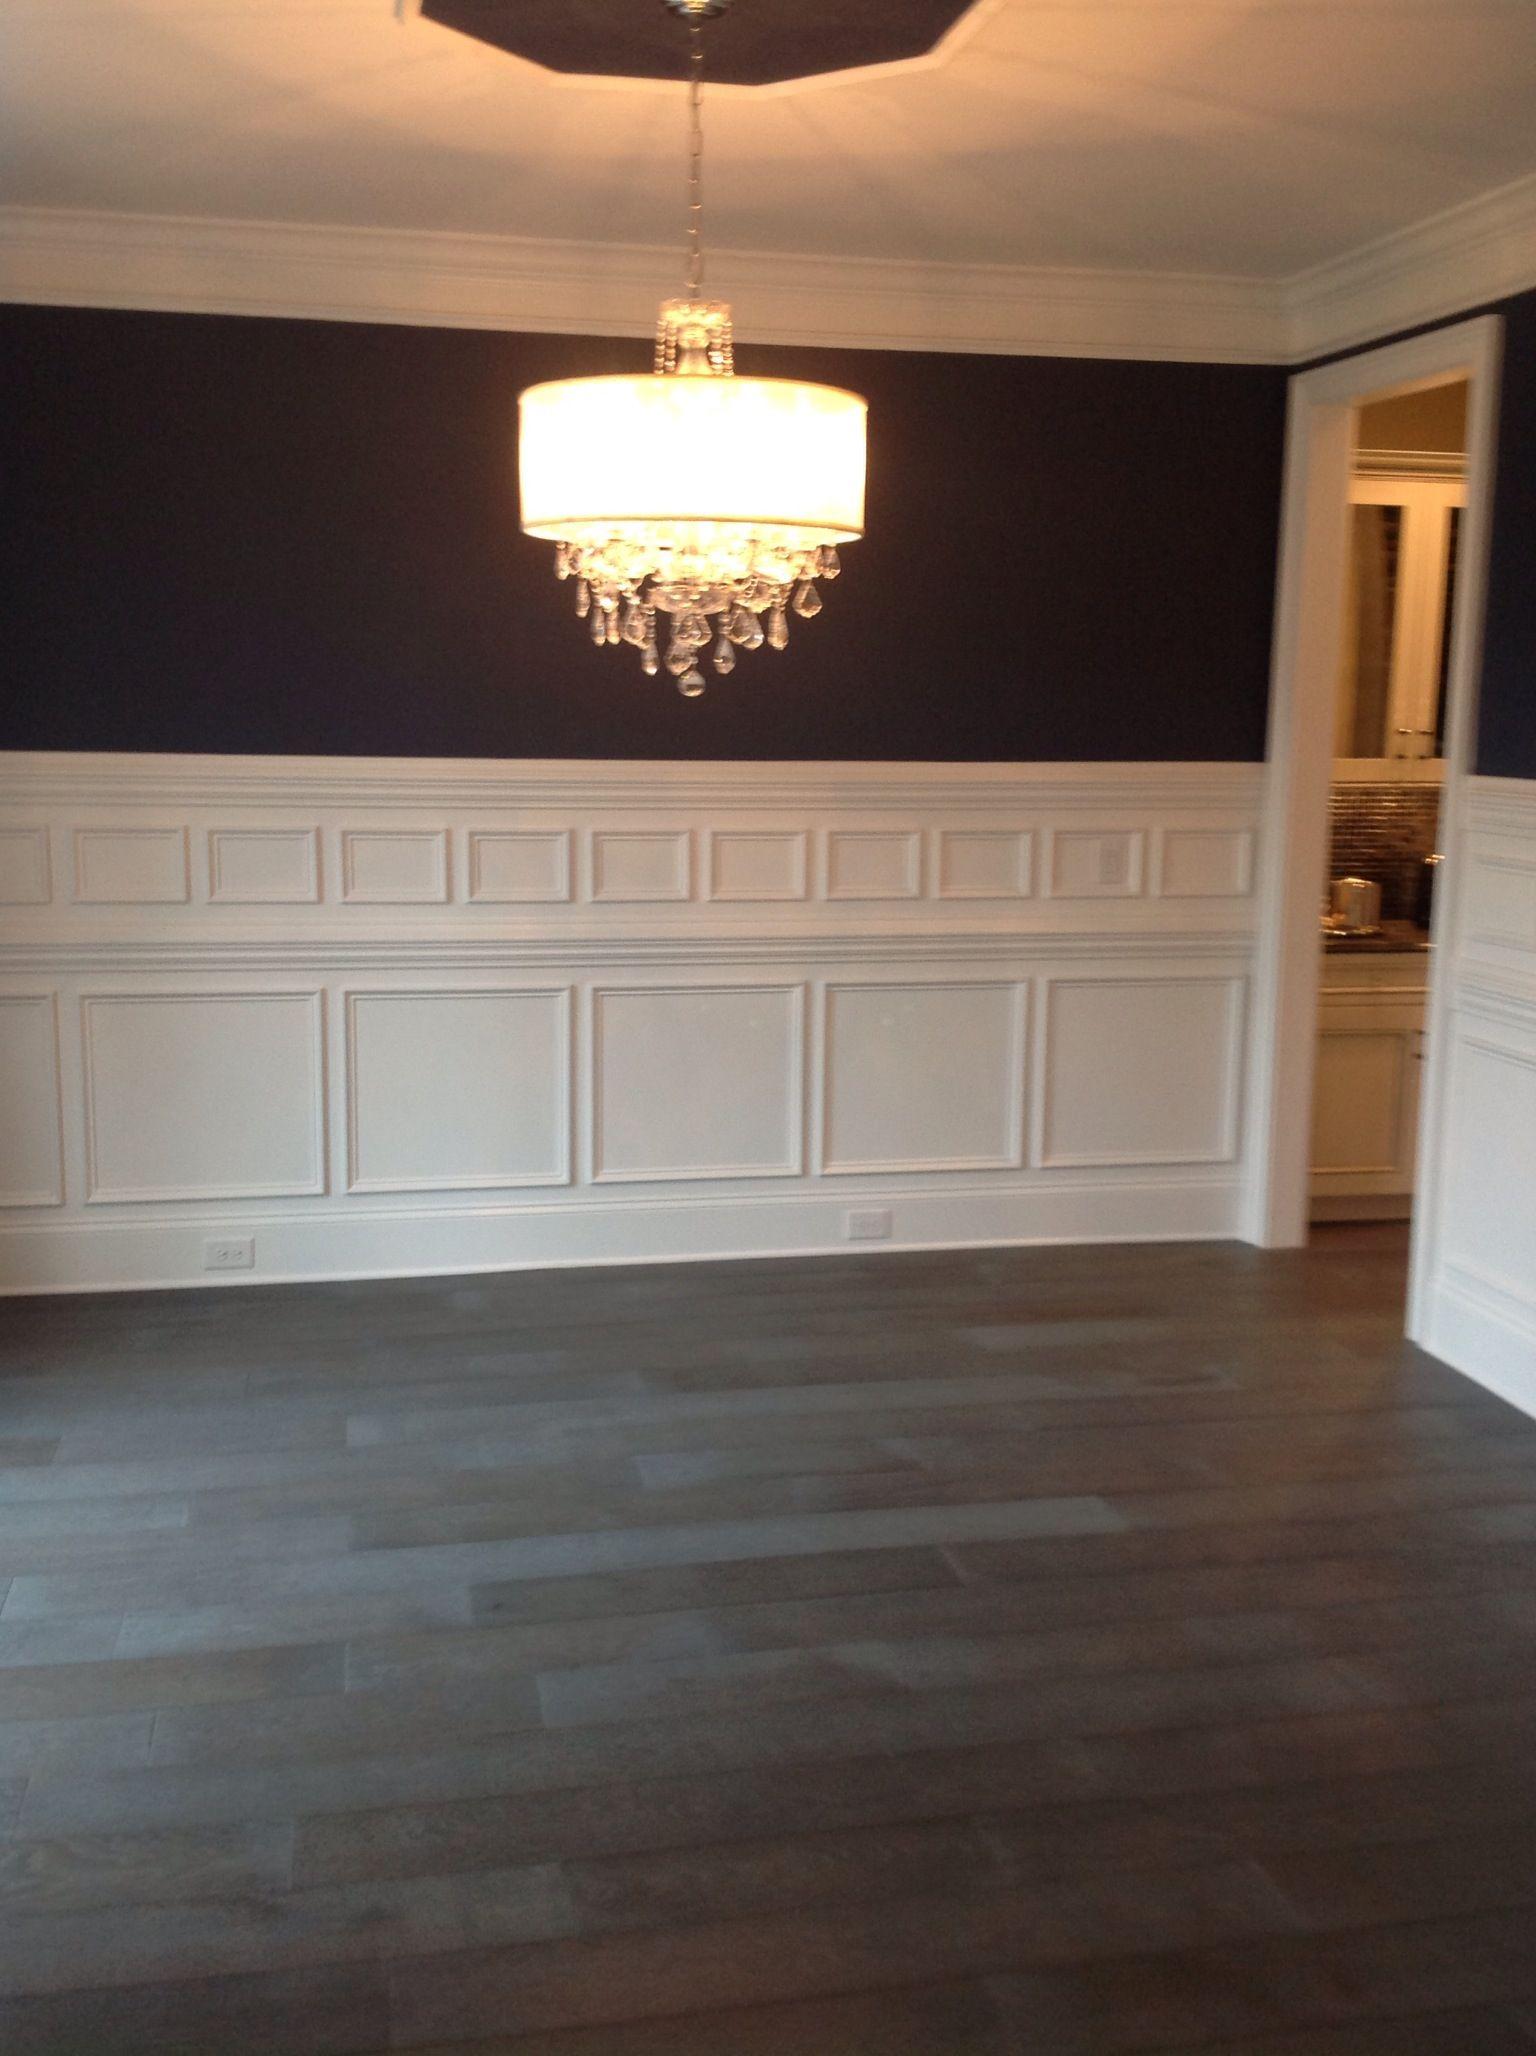 Dining room 5 custom paneling indigo batik paint by sherwin williams chandelier by butler lighting